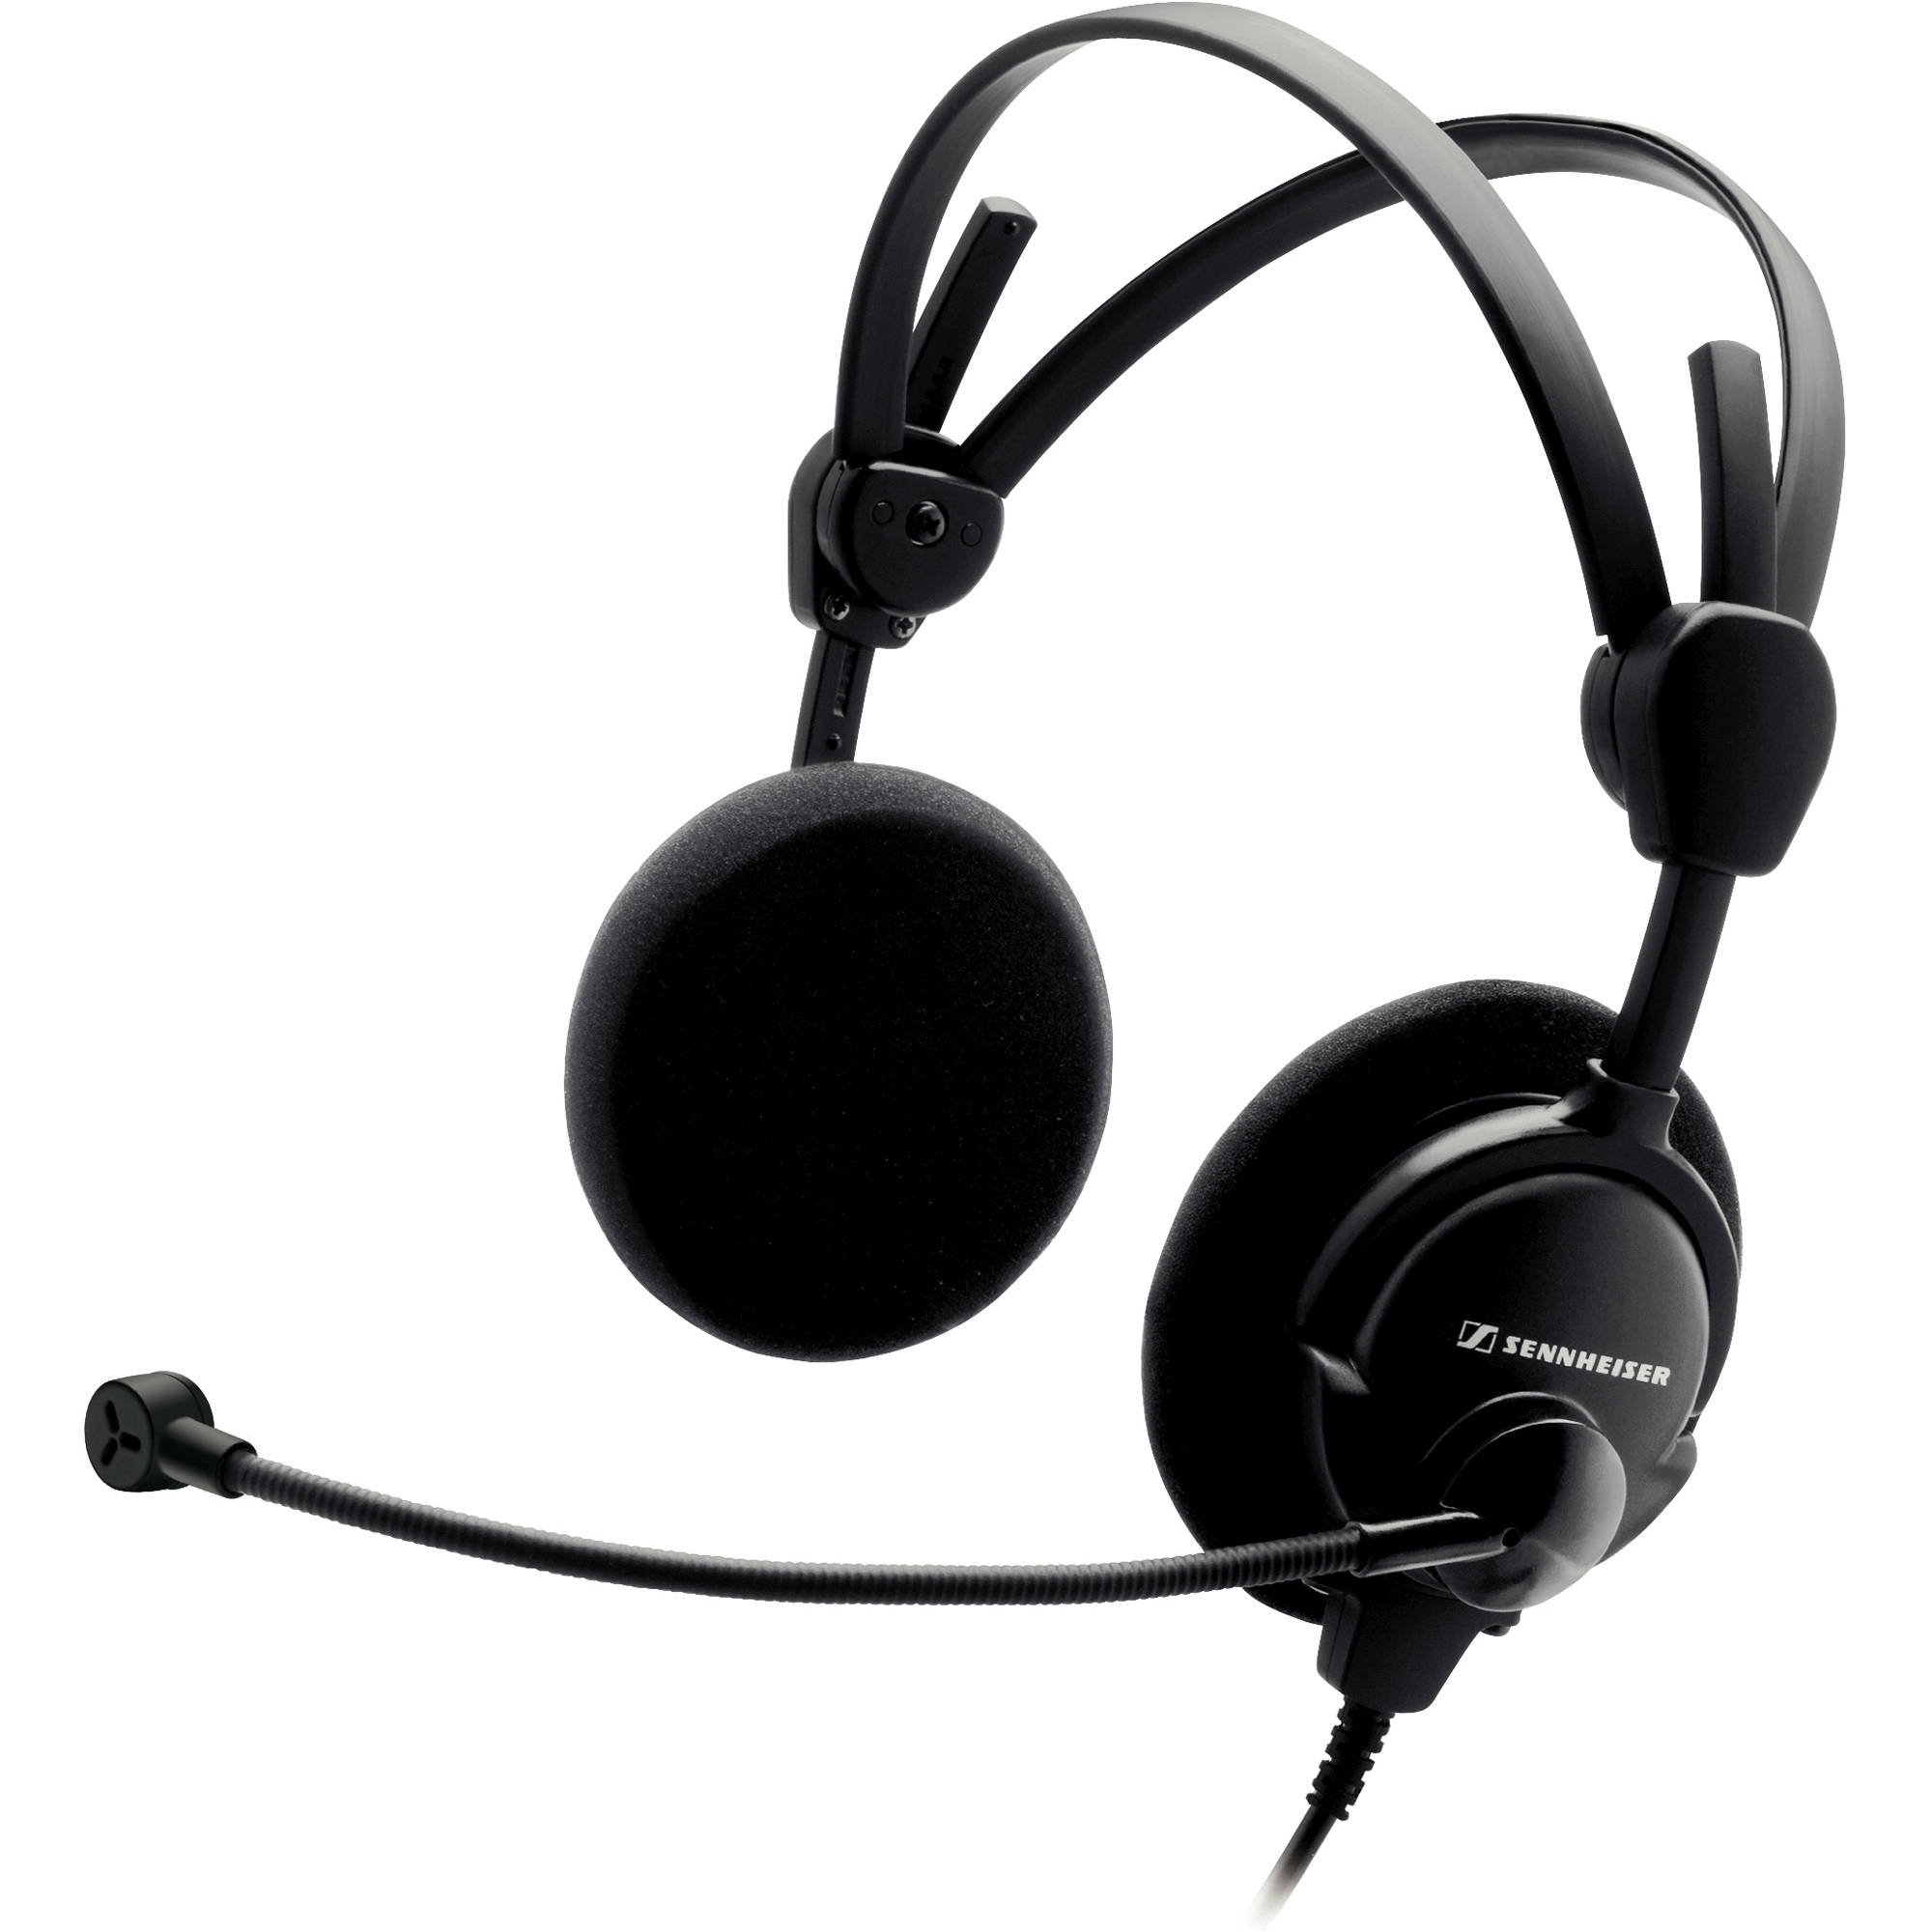 sennheiser headset with condenser microphone hme 46 dcn. Black Bedroom Furniture Sets. Home Design Ideas